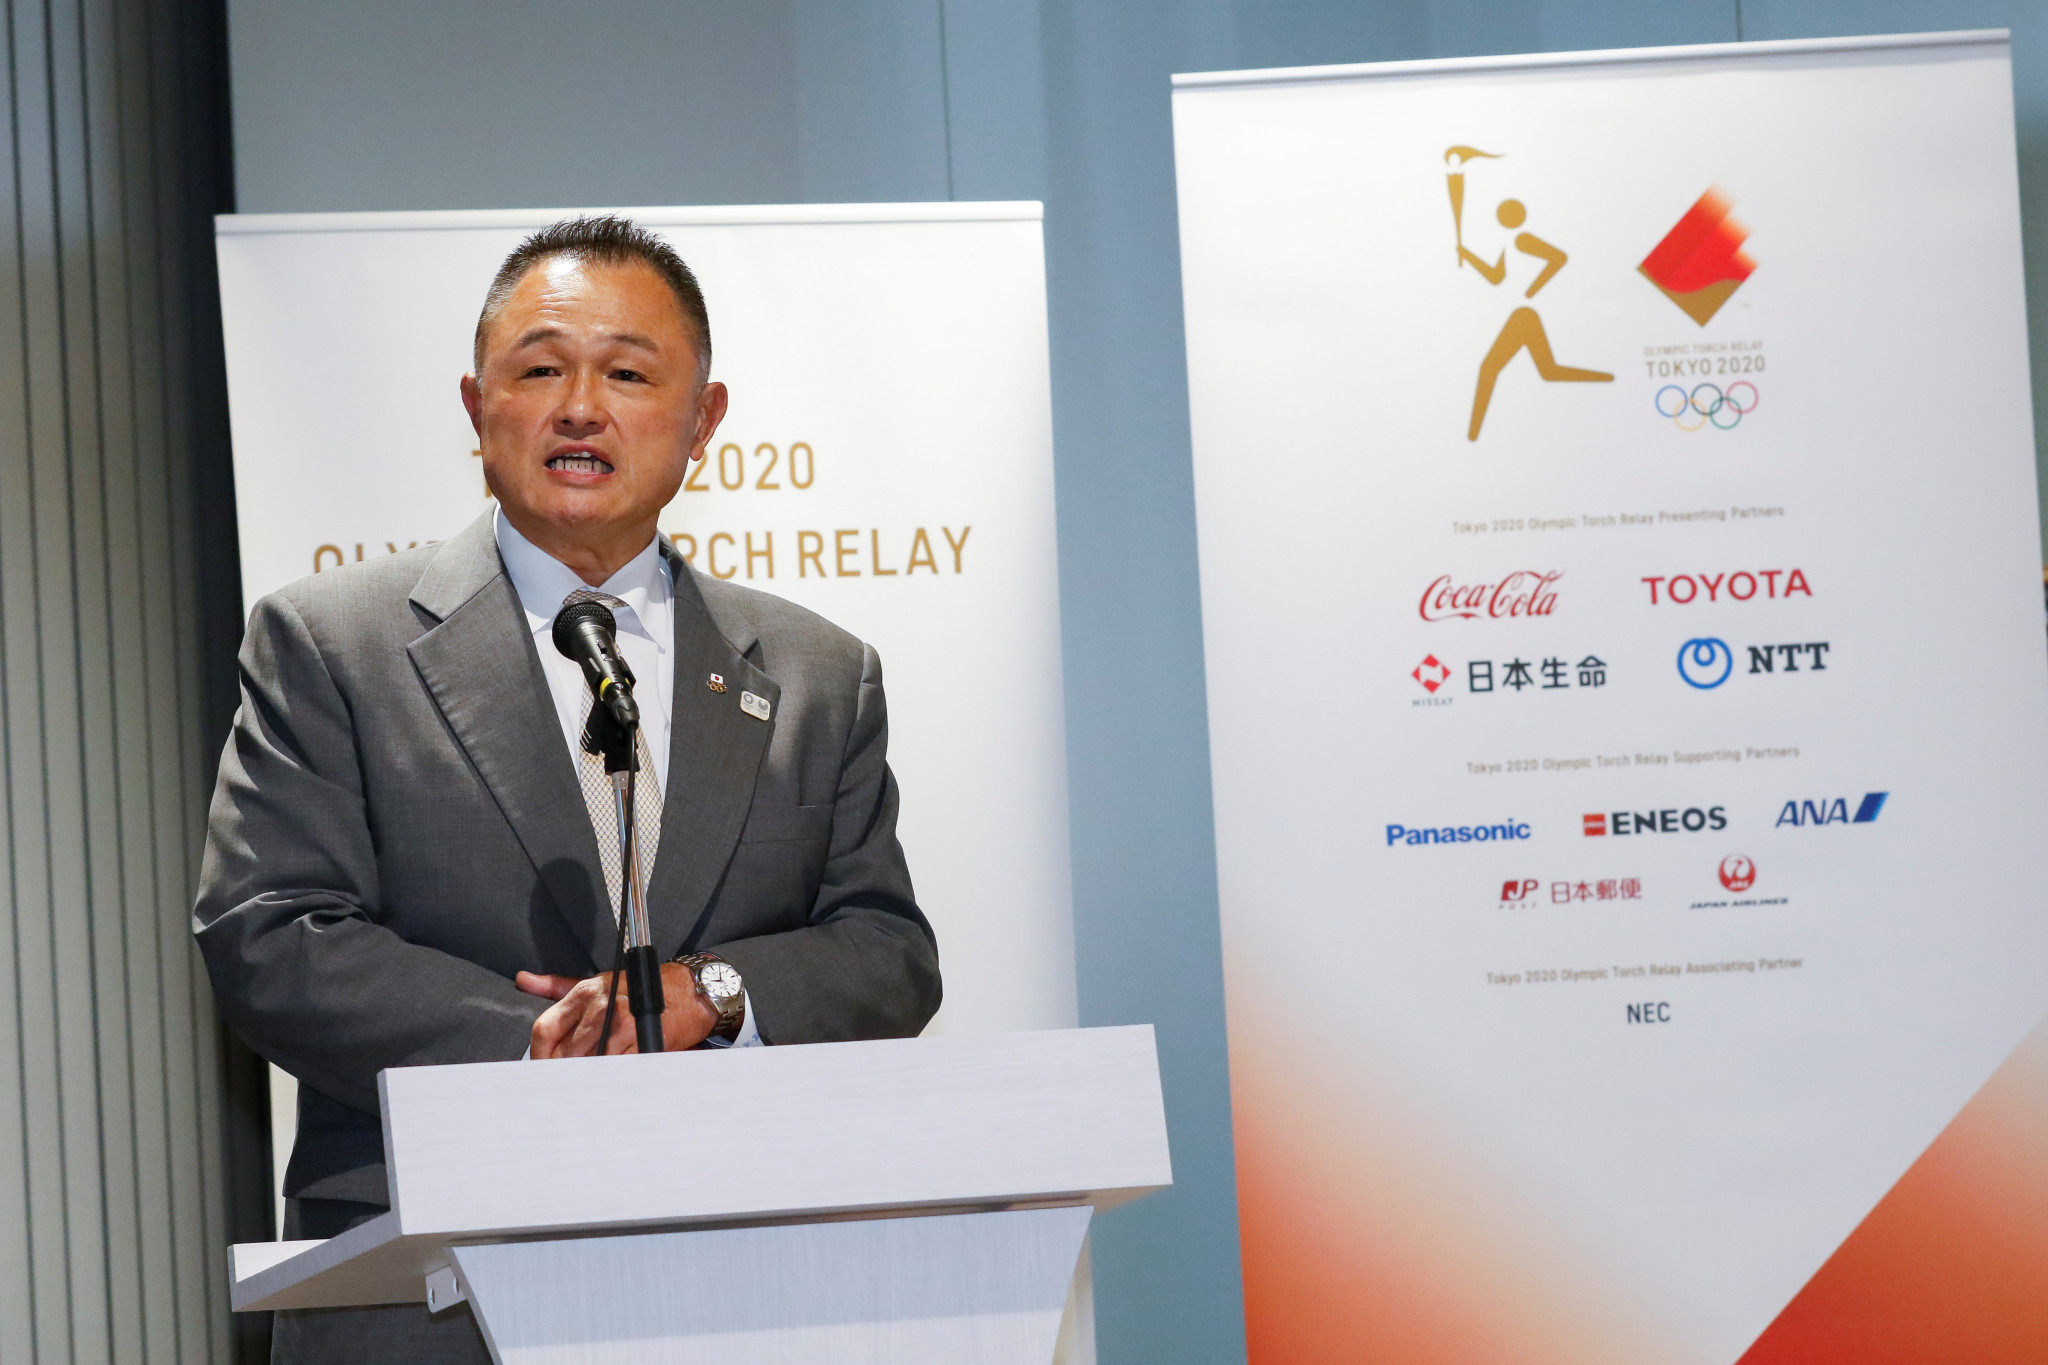 """No way"" to ensure zero COVID-19 cases arriving in Tokyo, JOC President admits"